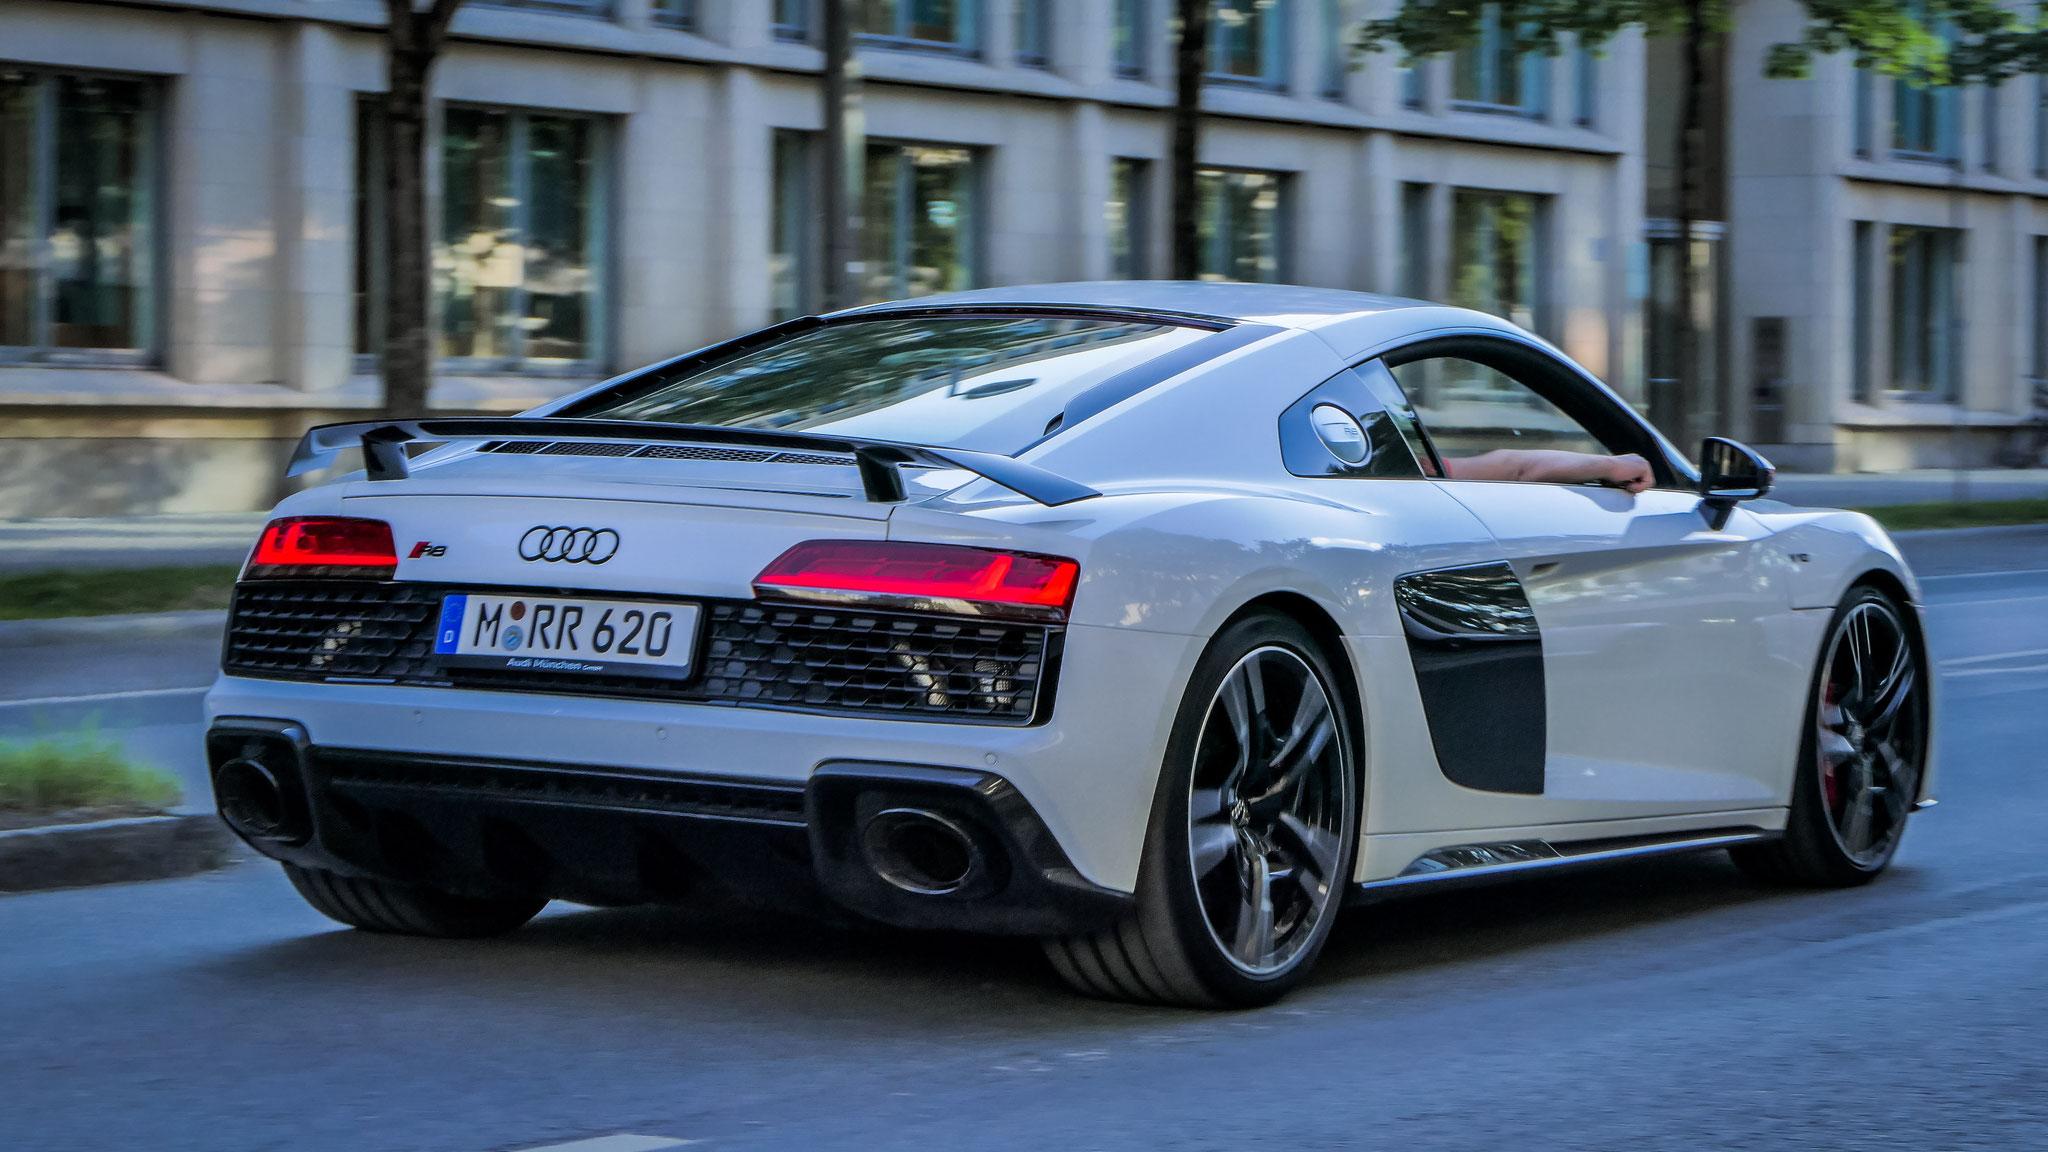 Audi R8 V10 - M-RR-620